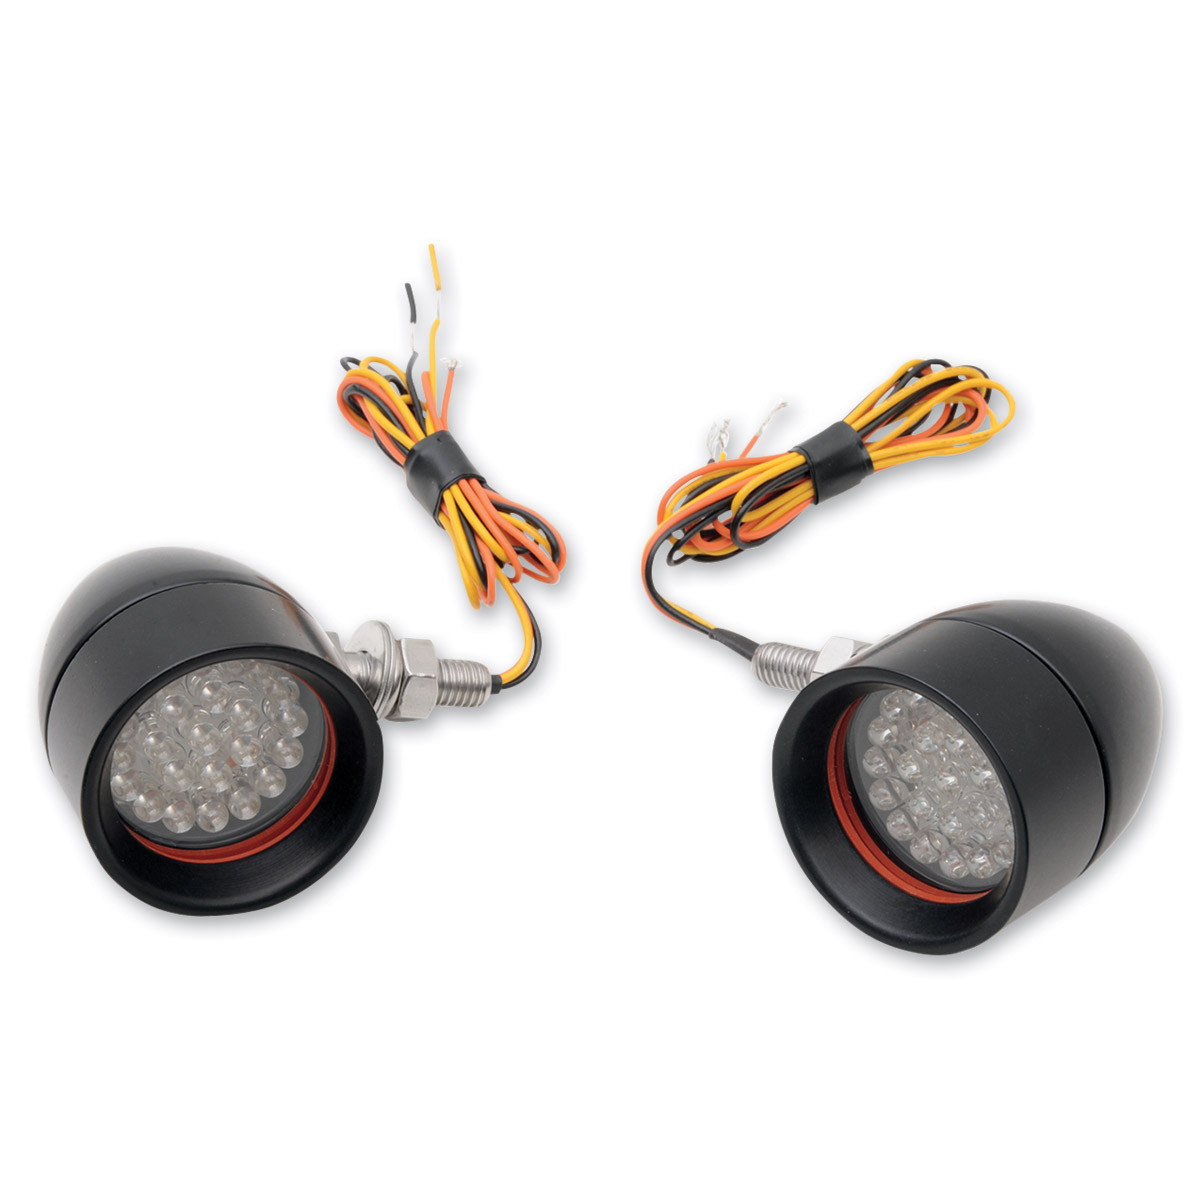 Custom Dynamics Black Anodized Mini Bullet LED Turn Signals with Amber LEDs